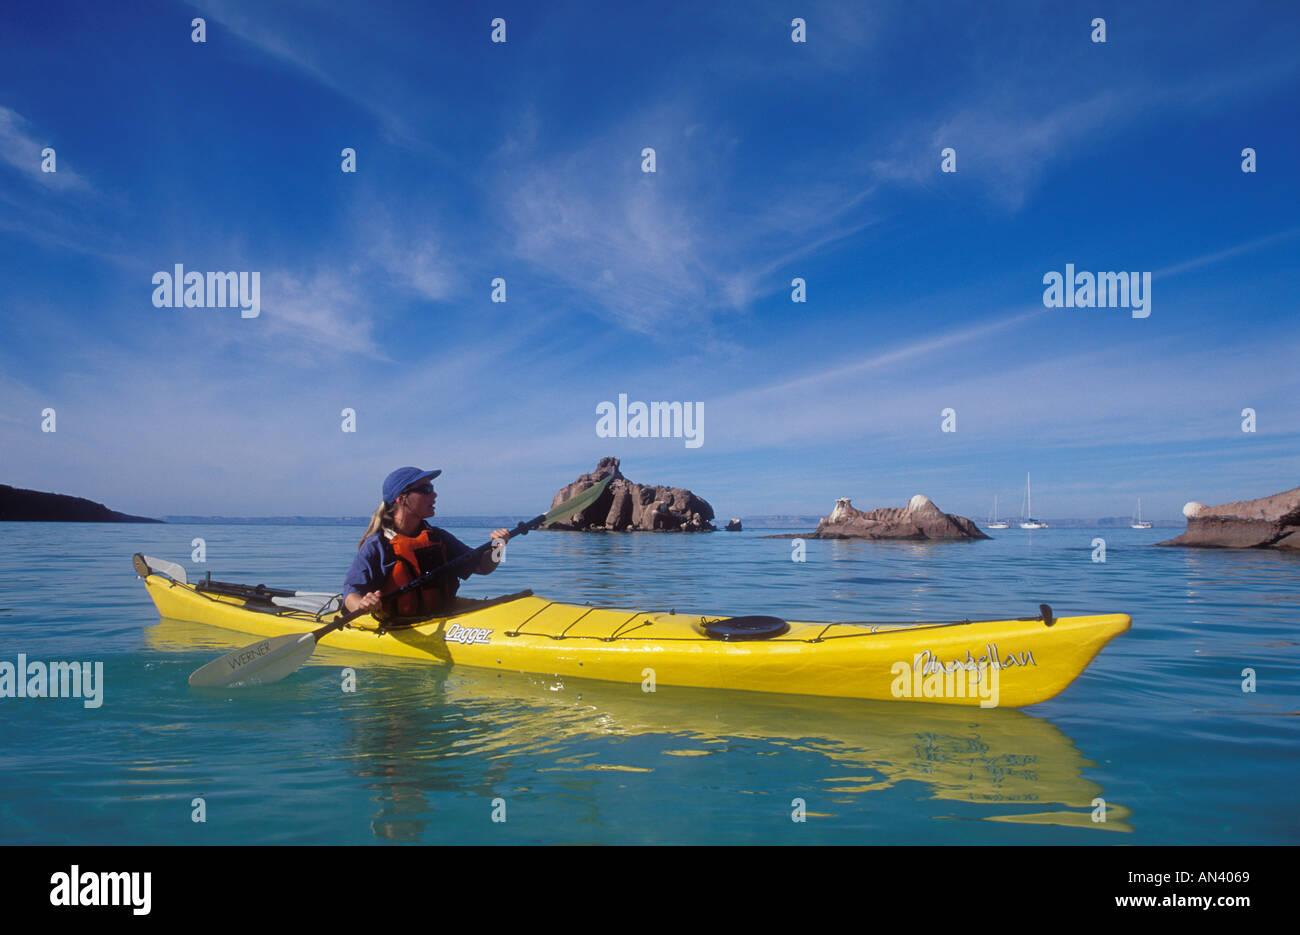 Baja California Sur Mexico woman sea kayaking in the Sea of Cortez at Espiritu Santo Island near La Paz - Stock Image